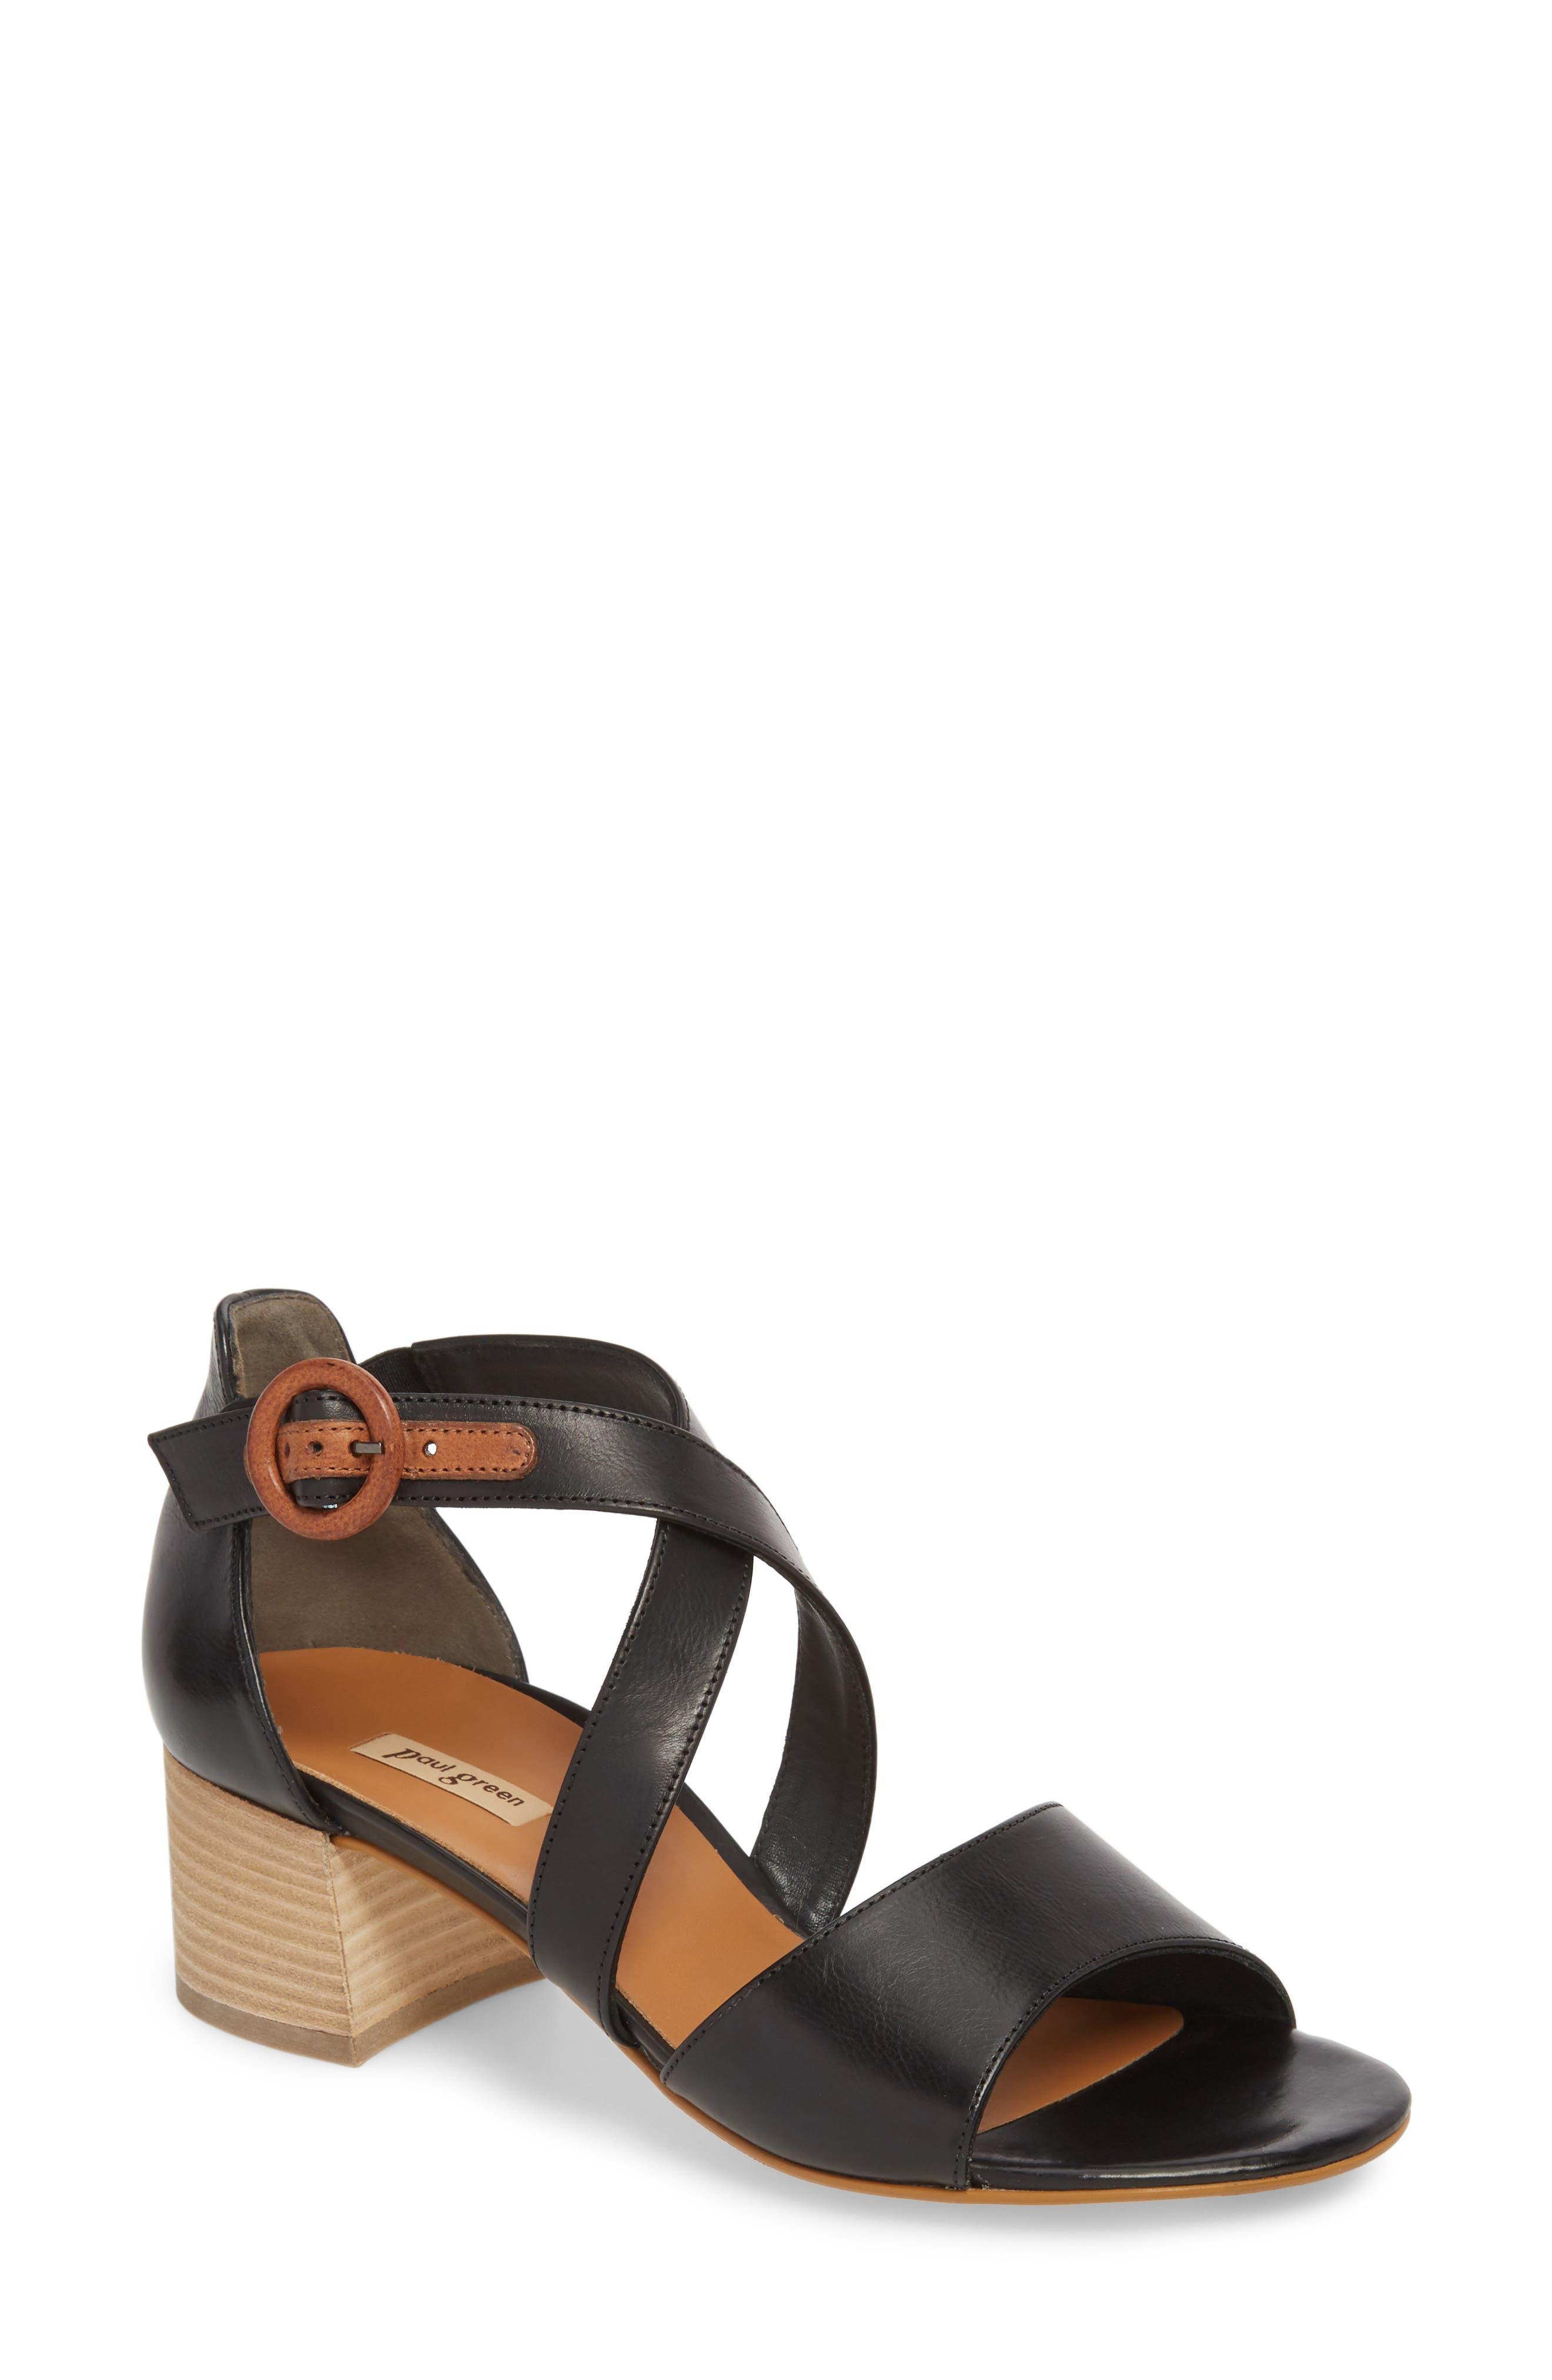 Sally Quarter Strap Sandal,                             Main thumbnail 1, color,                             Black Leather